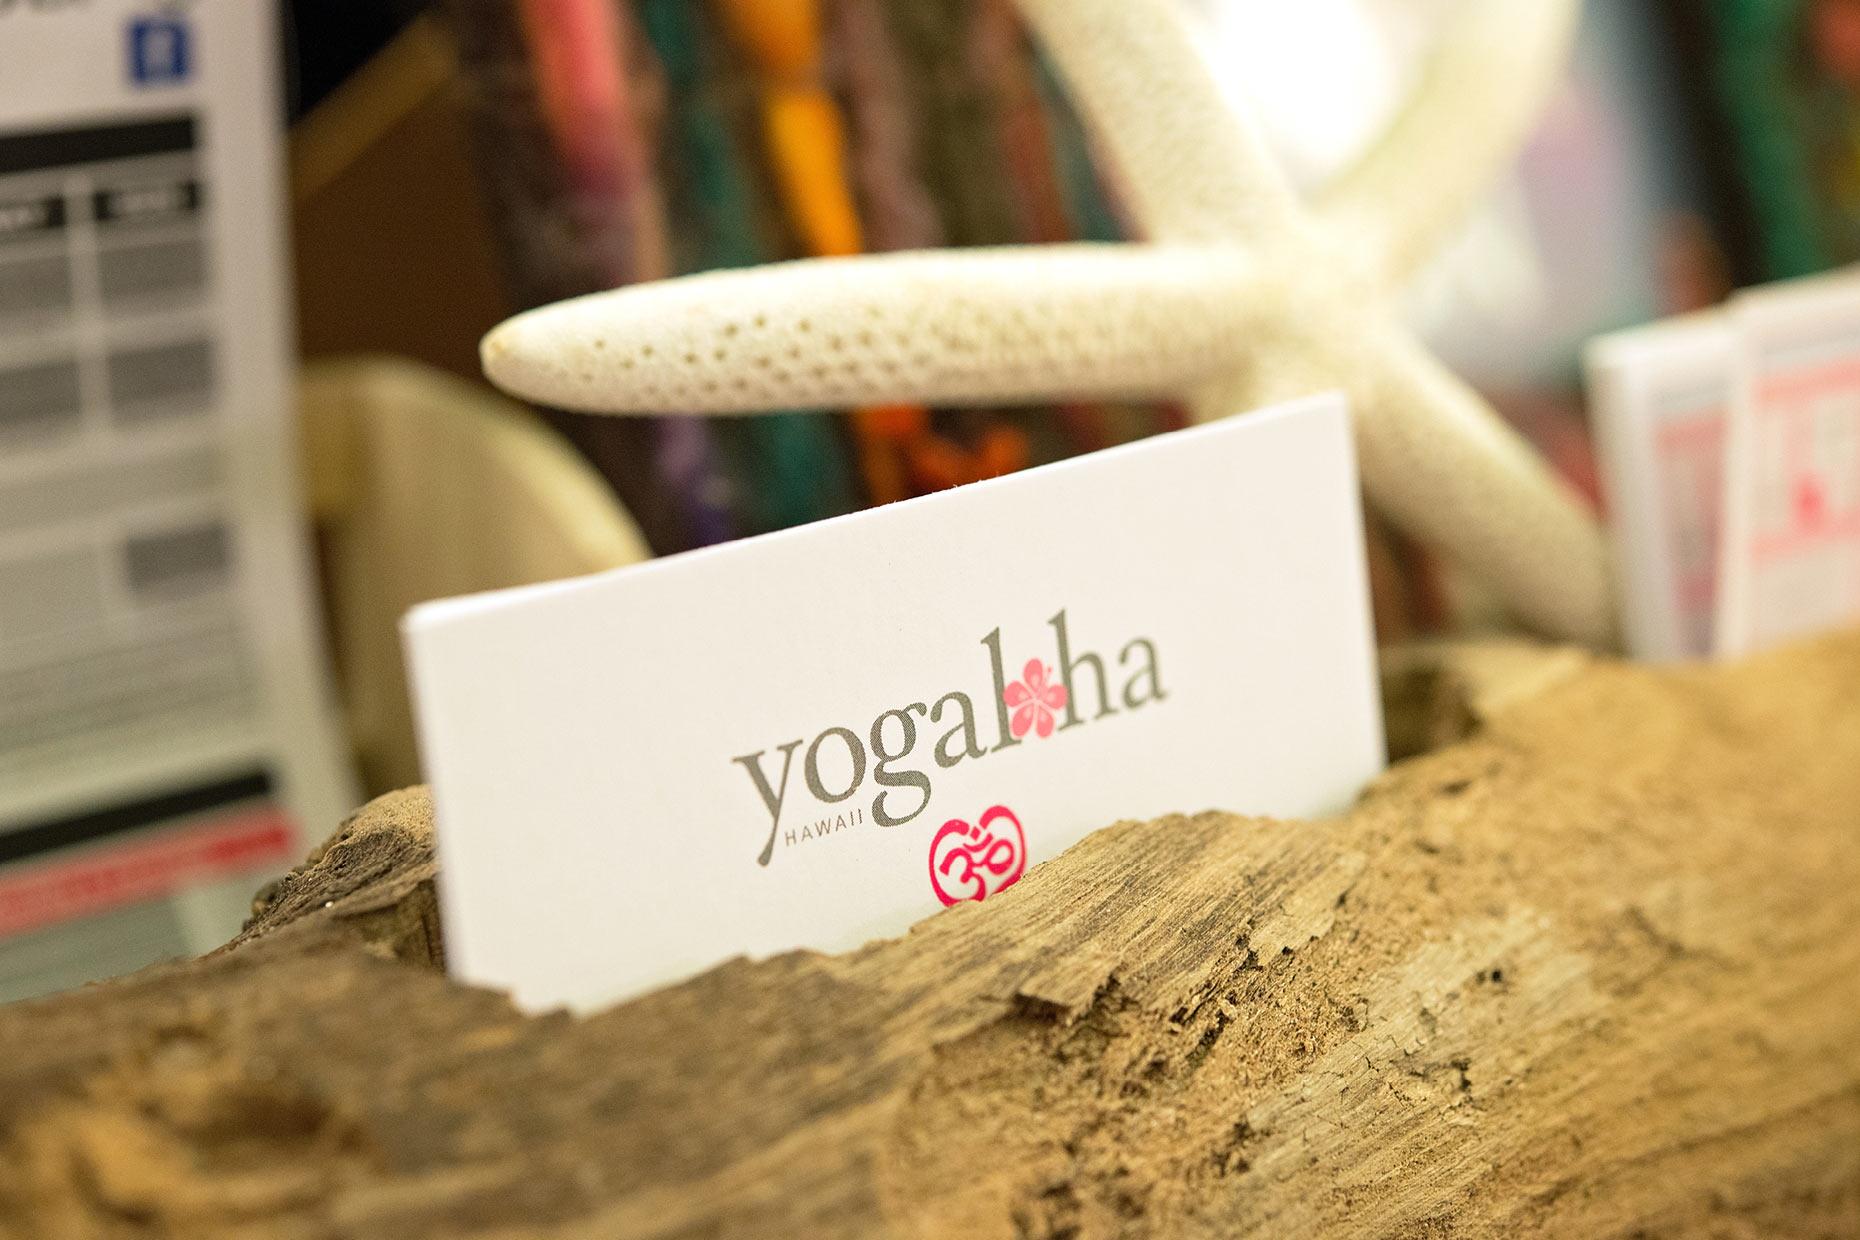 Yogaloha Hawaii card